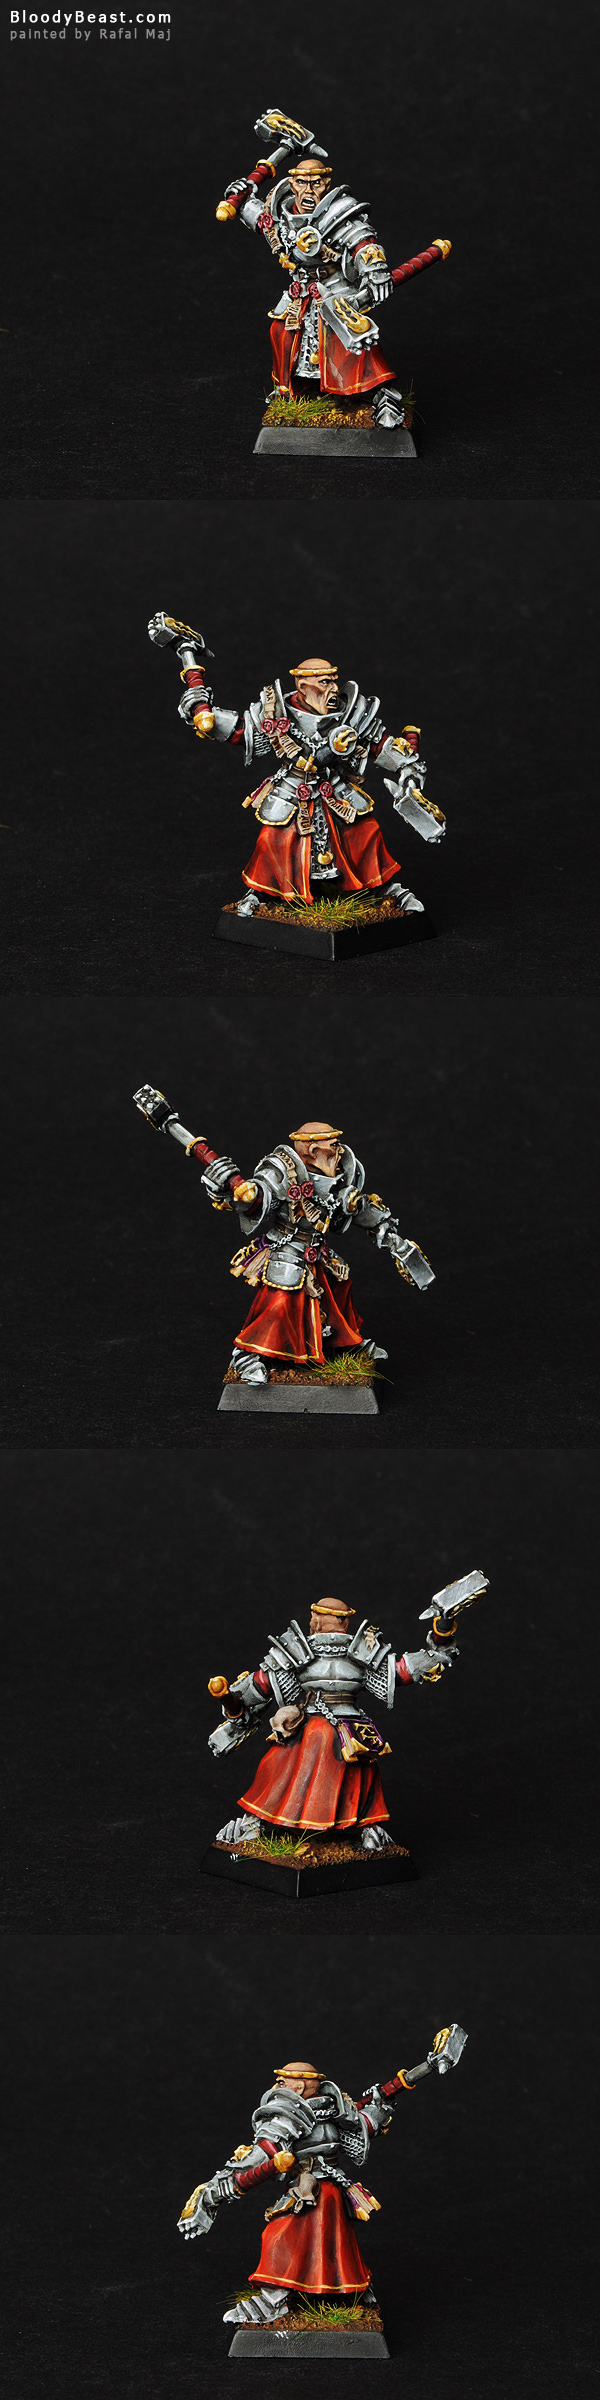 Empire Warrior Priest painted by Rafal Maj (BloodyBeast.com)